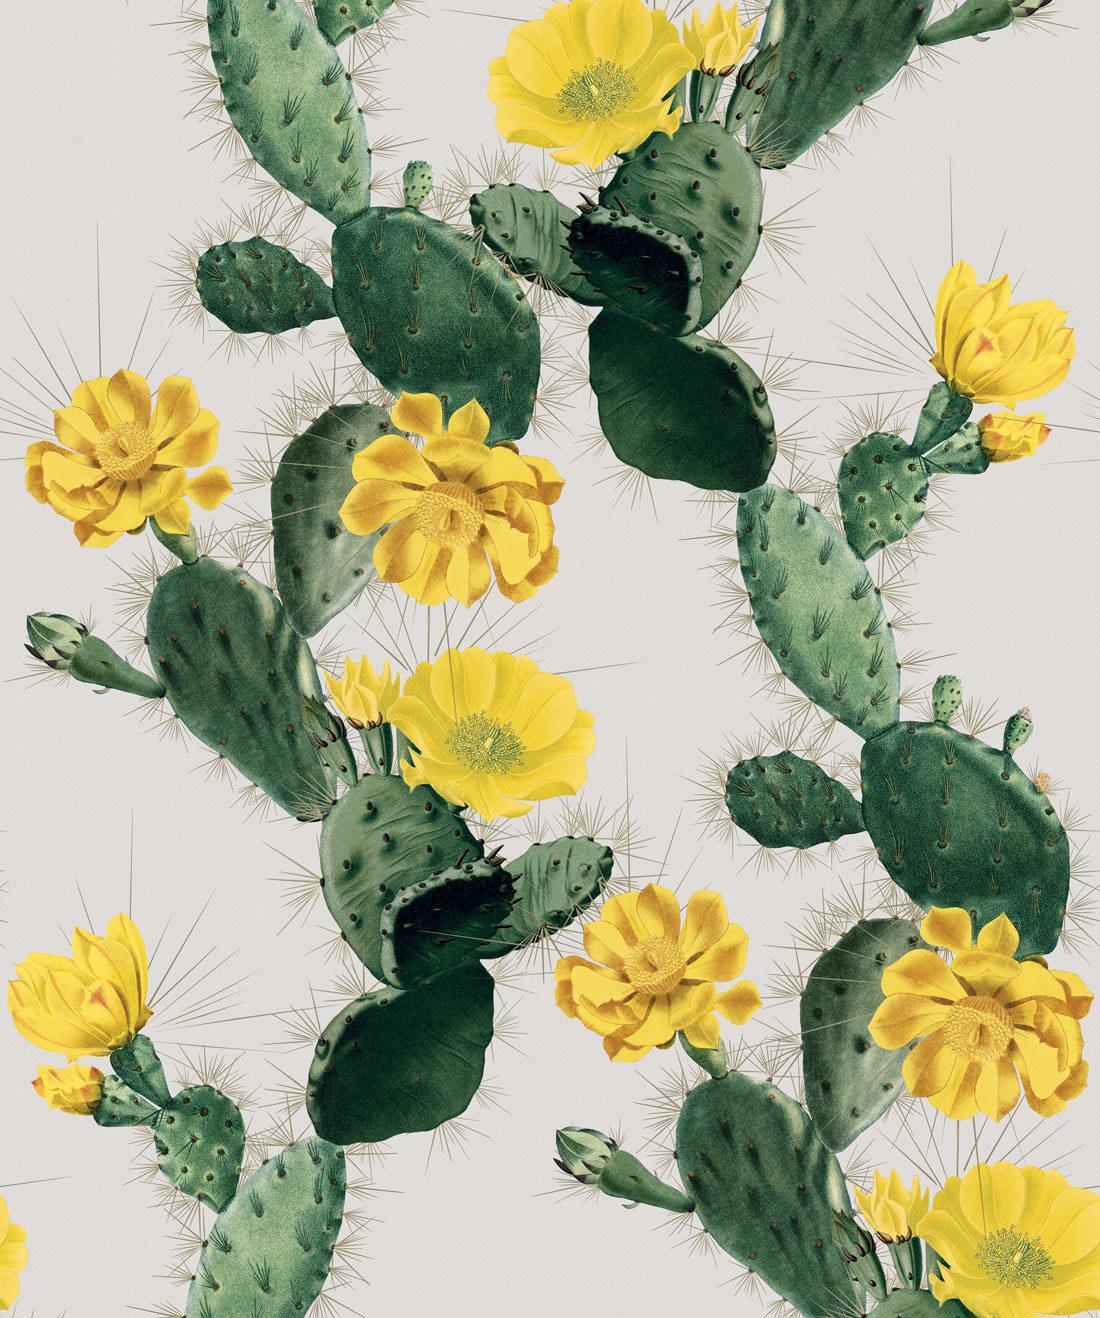 Cactus Yellow Day